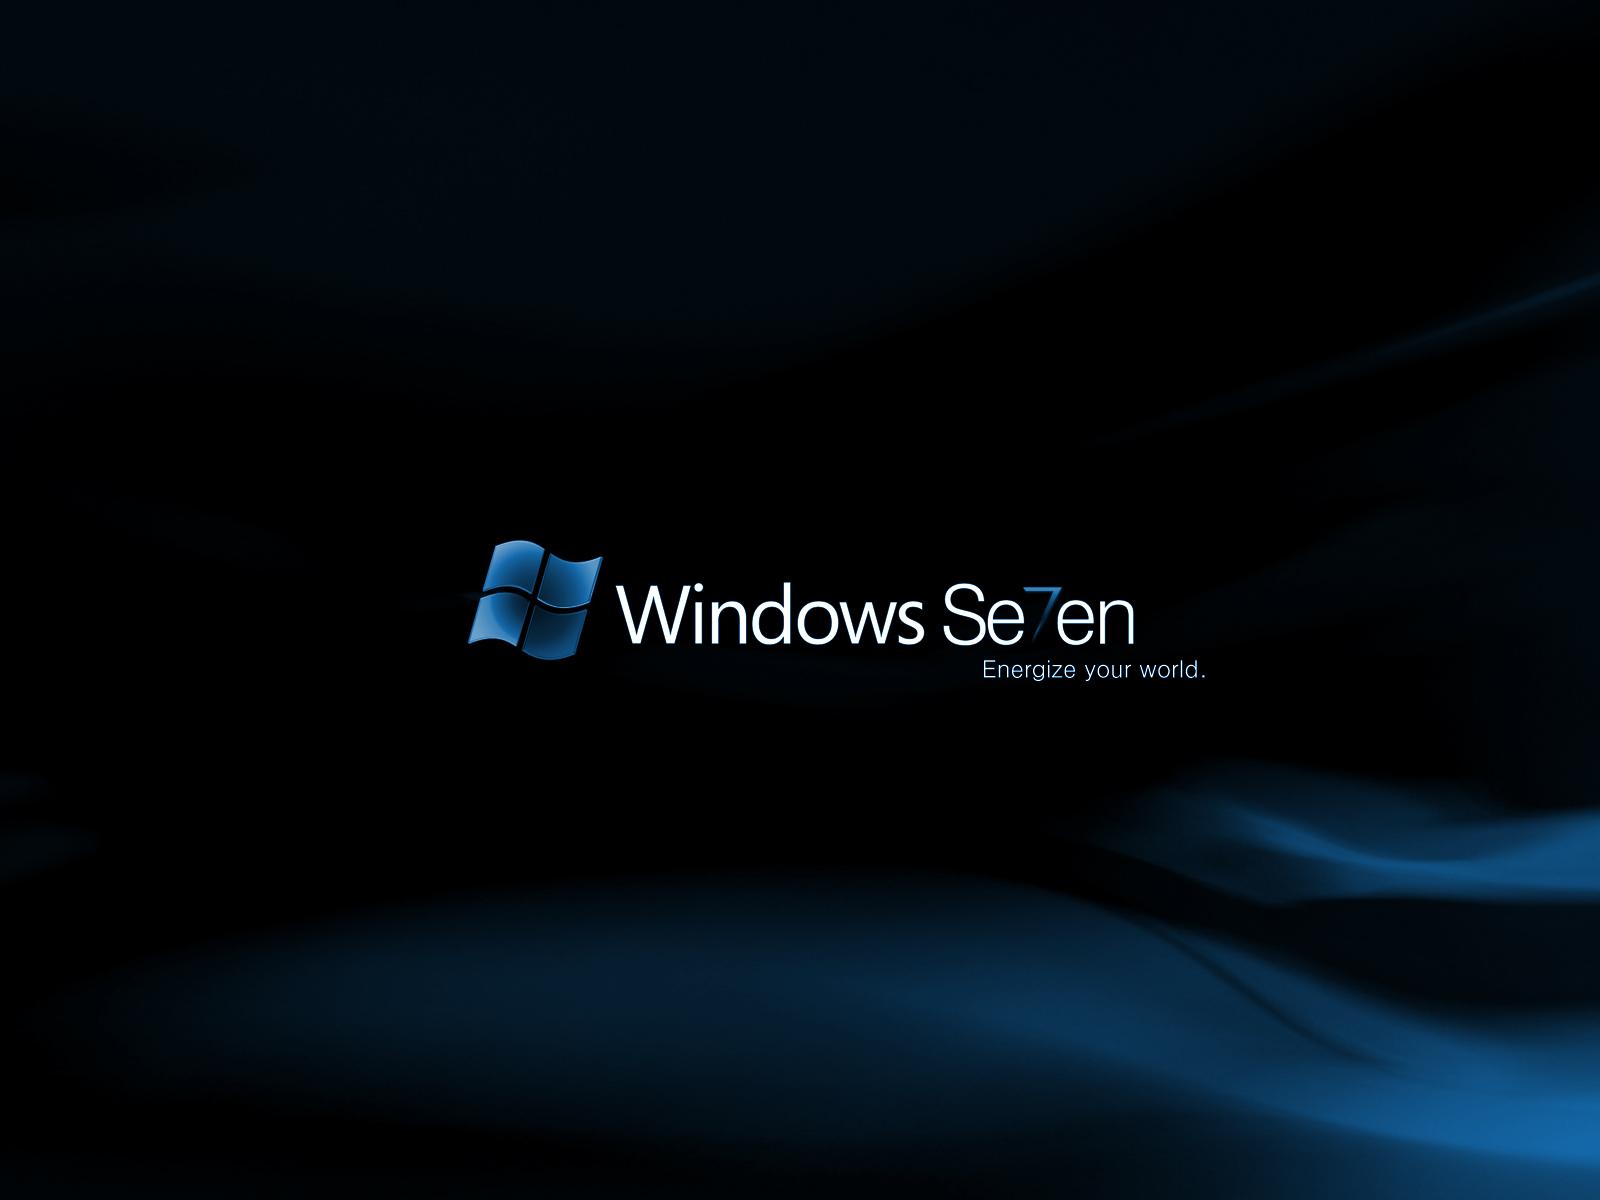 http://3.bp.blogspot.com/-Rd28RQkOojY/UFRPxpMYPjI/AAAAAAAAE4c/GEckqZl3Atg/s1600/Windows+7+ultimate+collection+of+wallpapers+(38).jpg